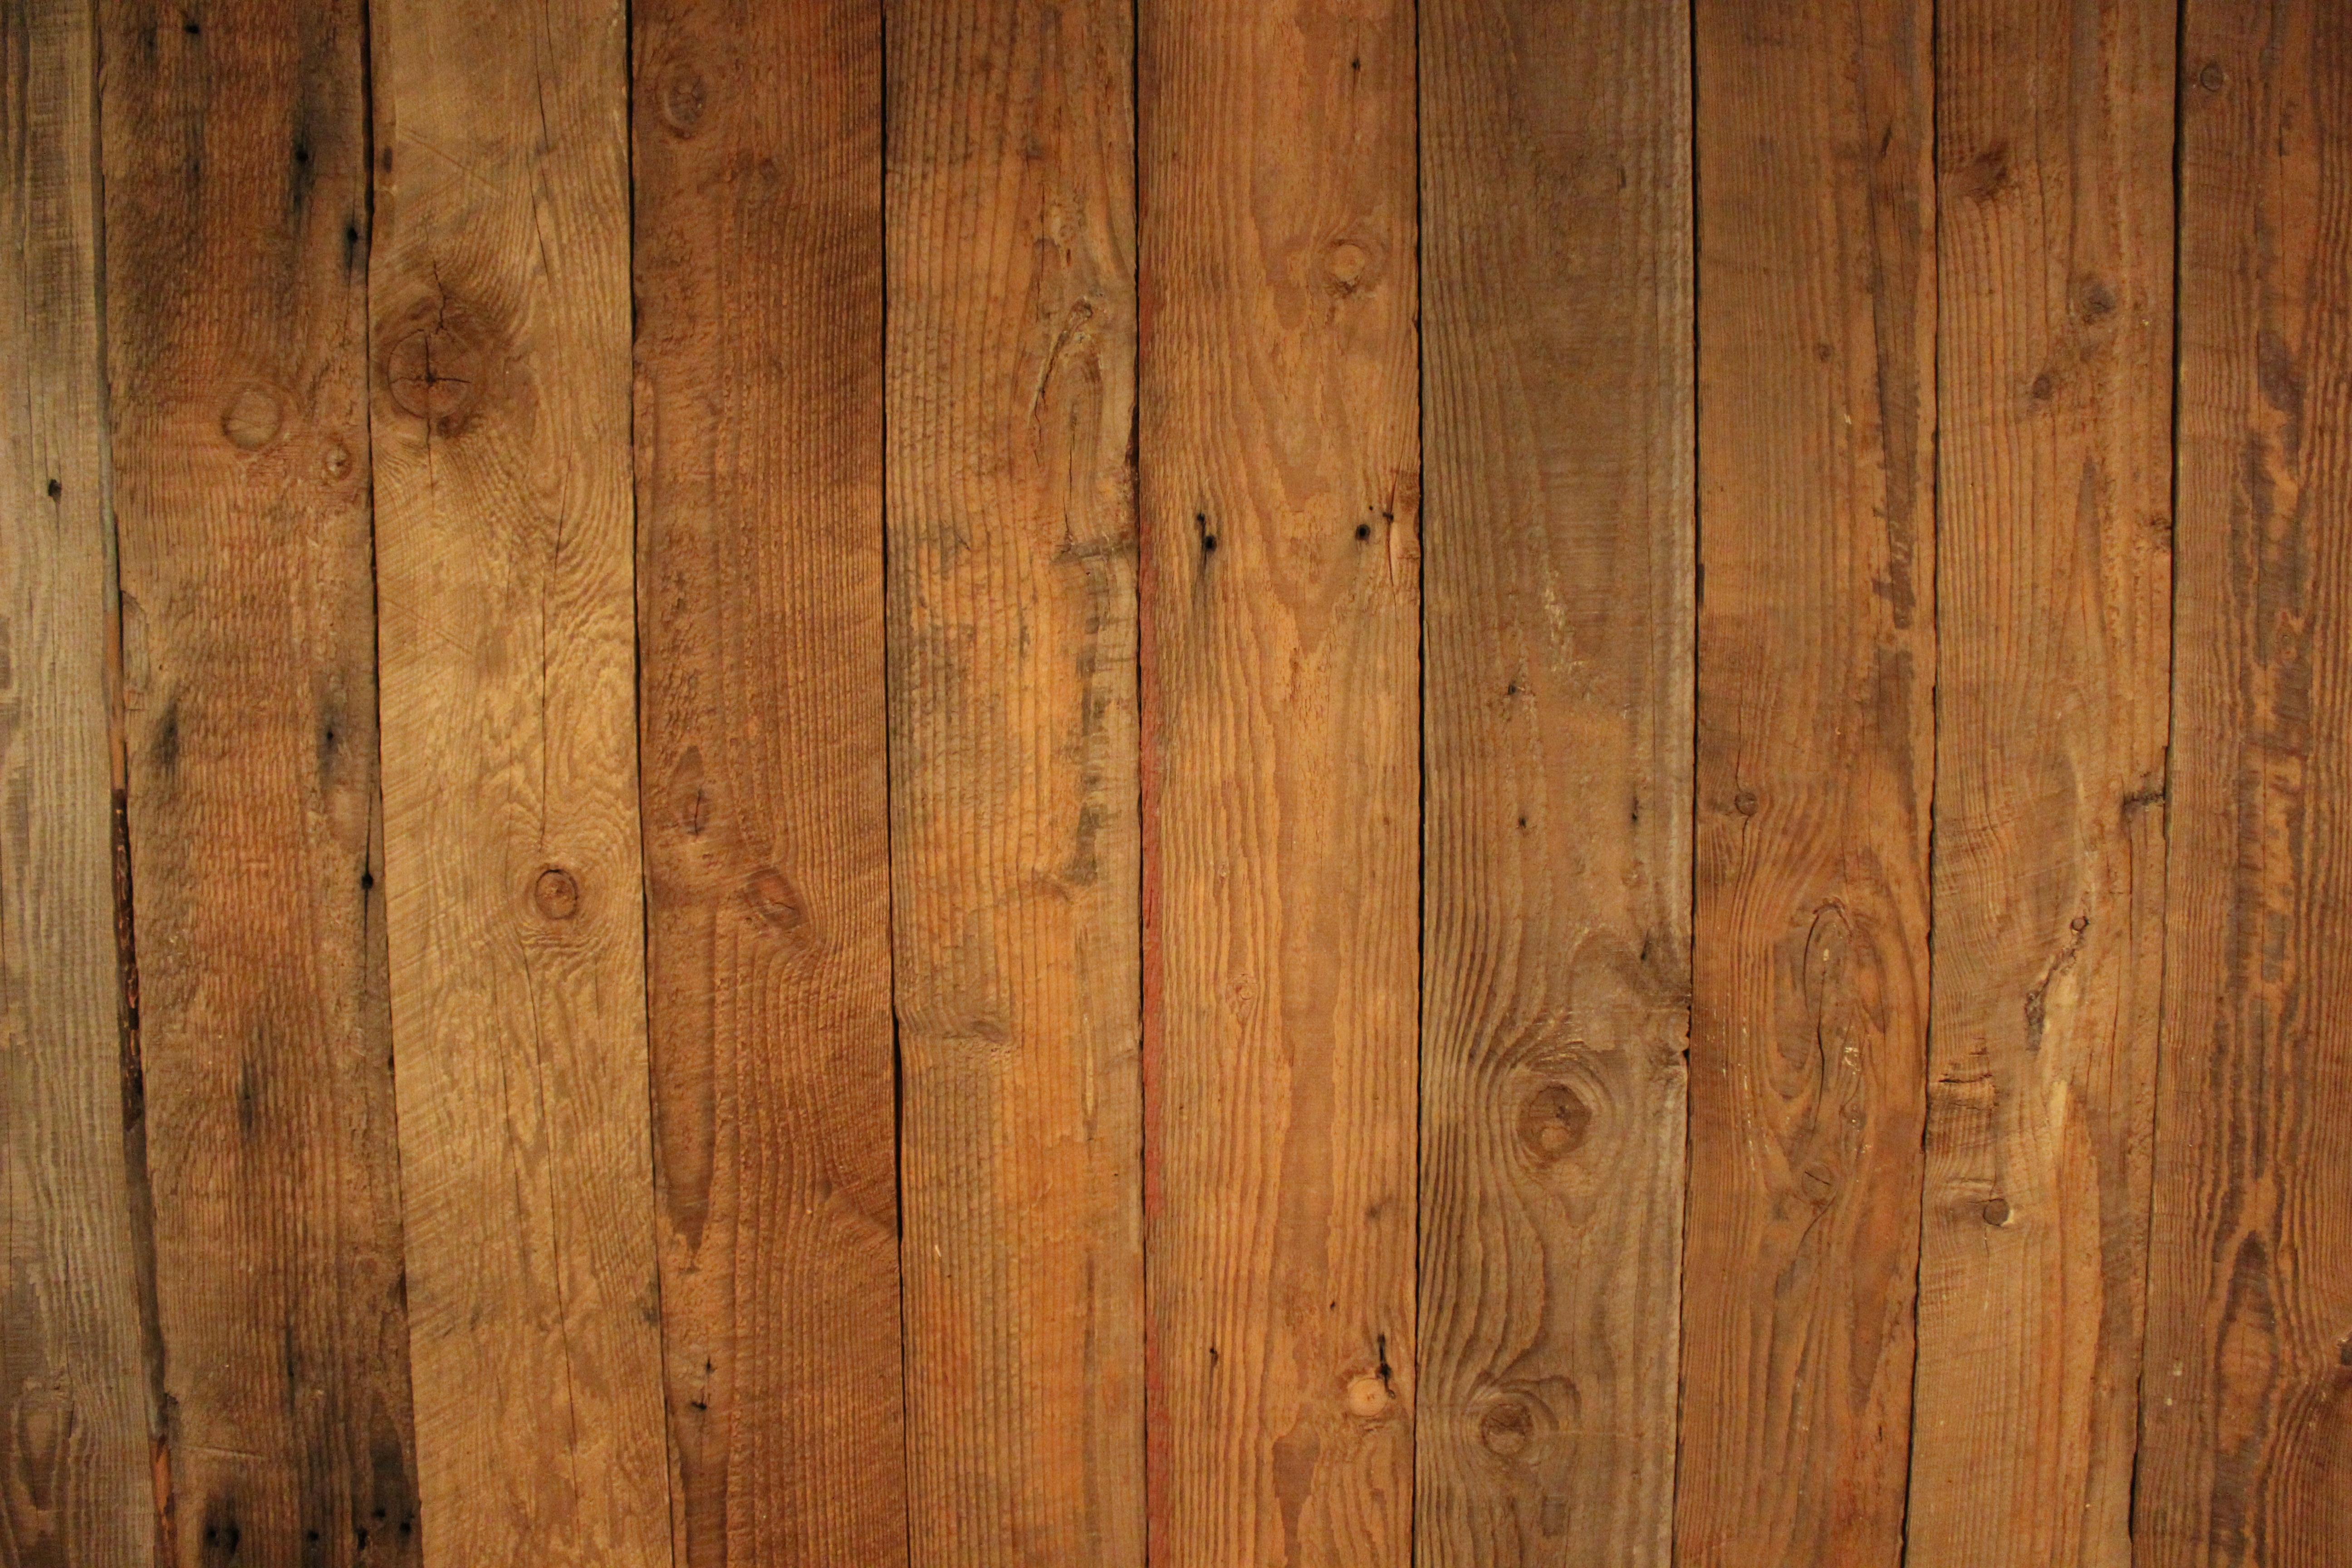 Barn Wood Wall Interior Car Interior Design Wood Paneling